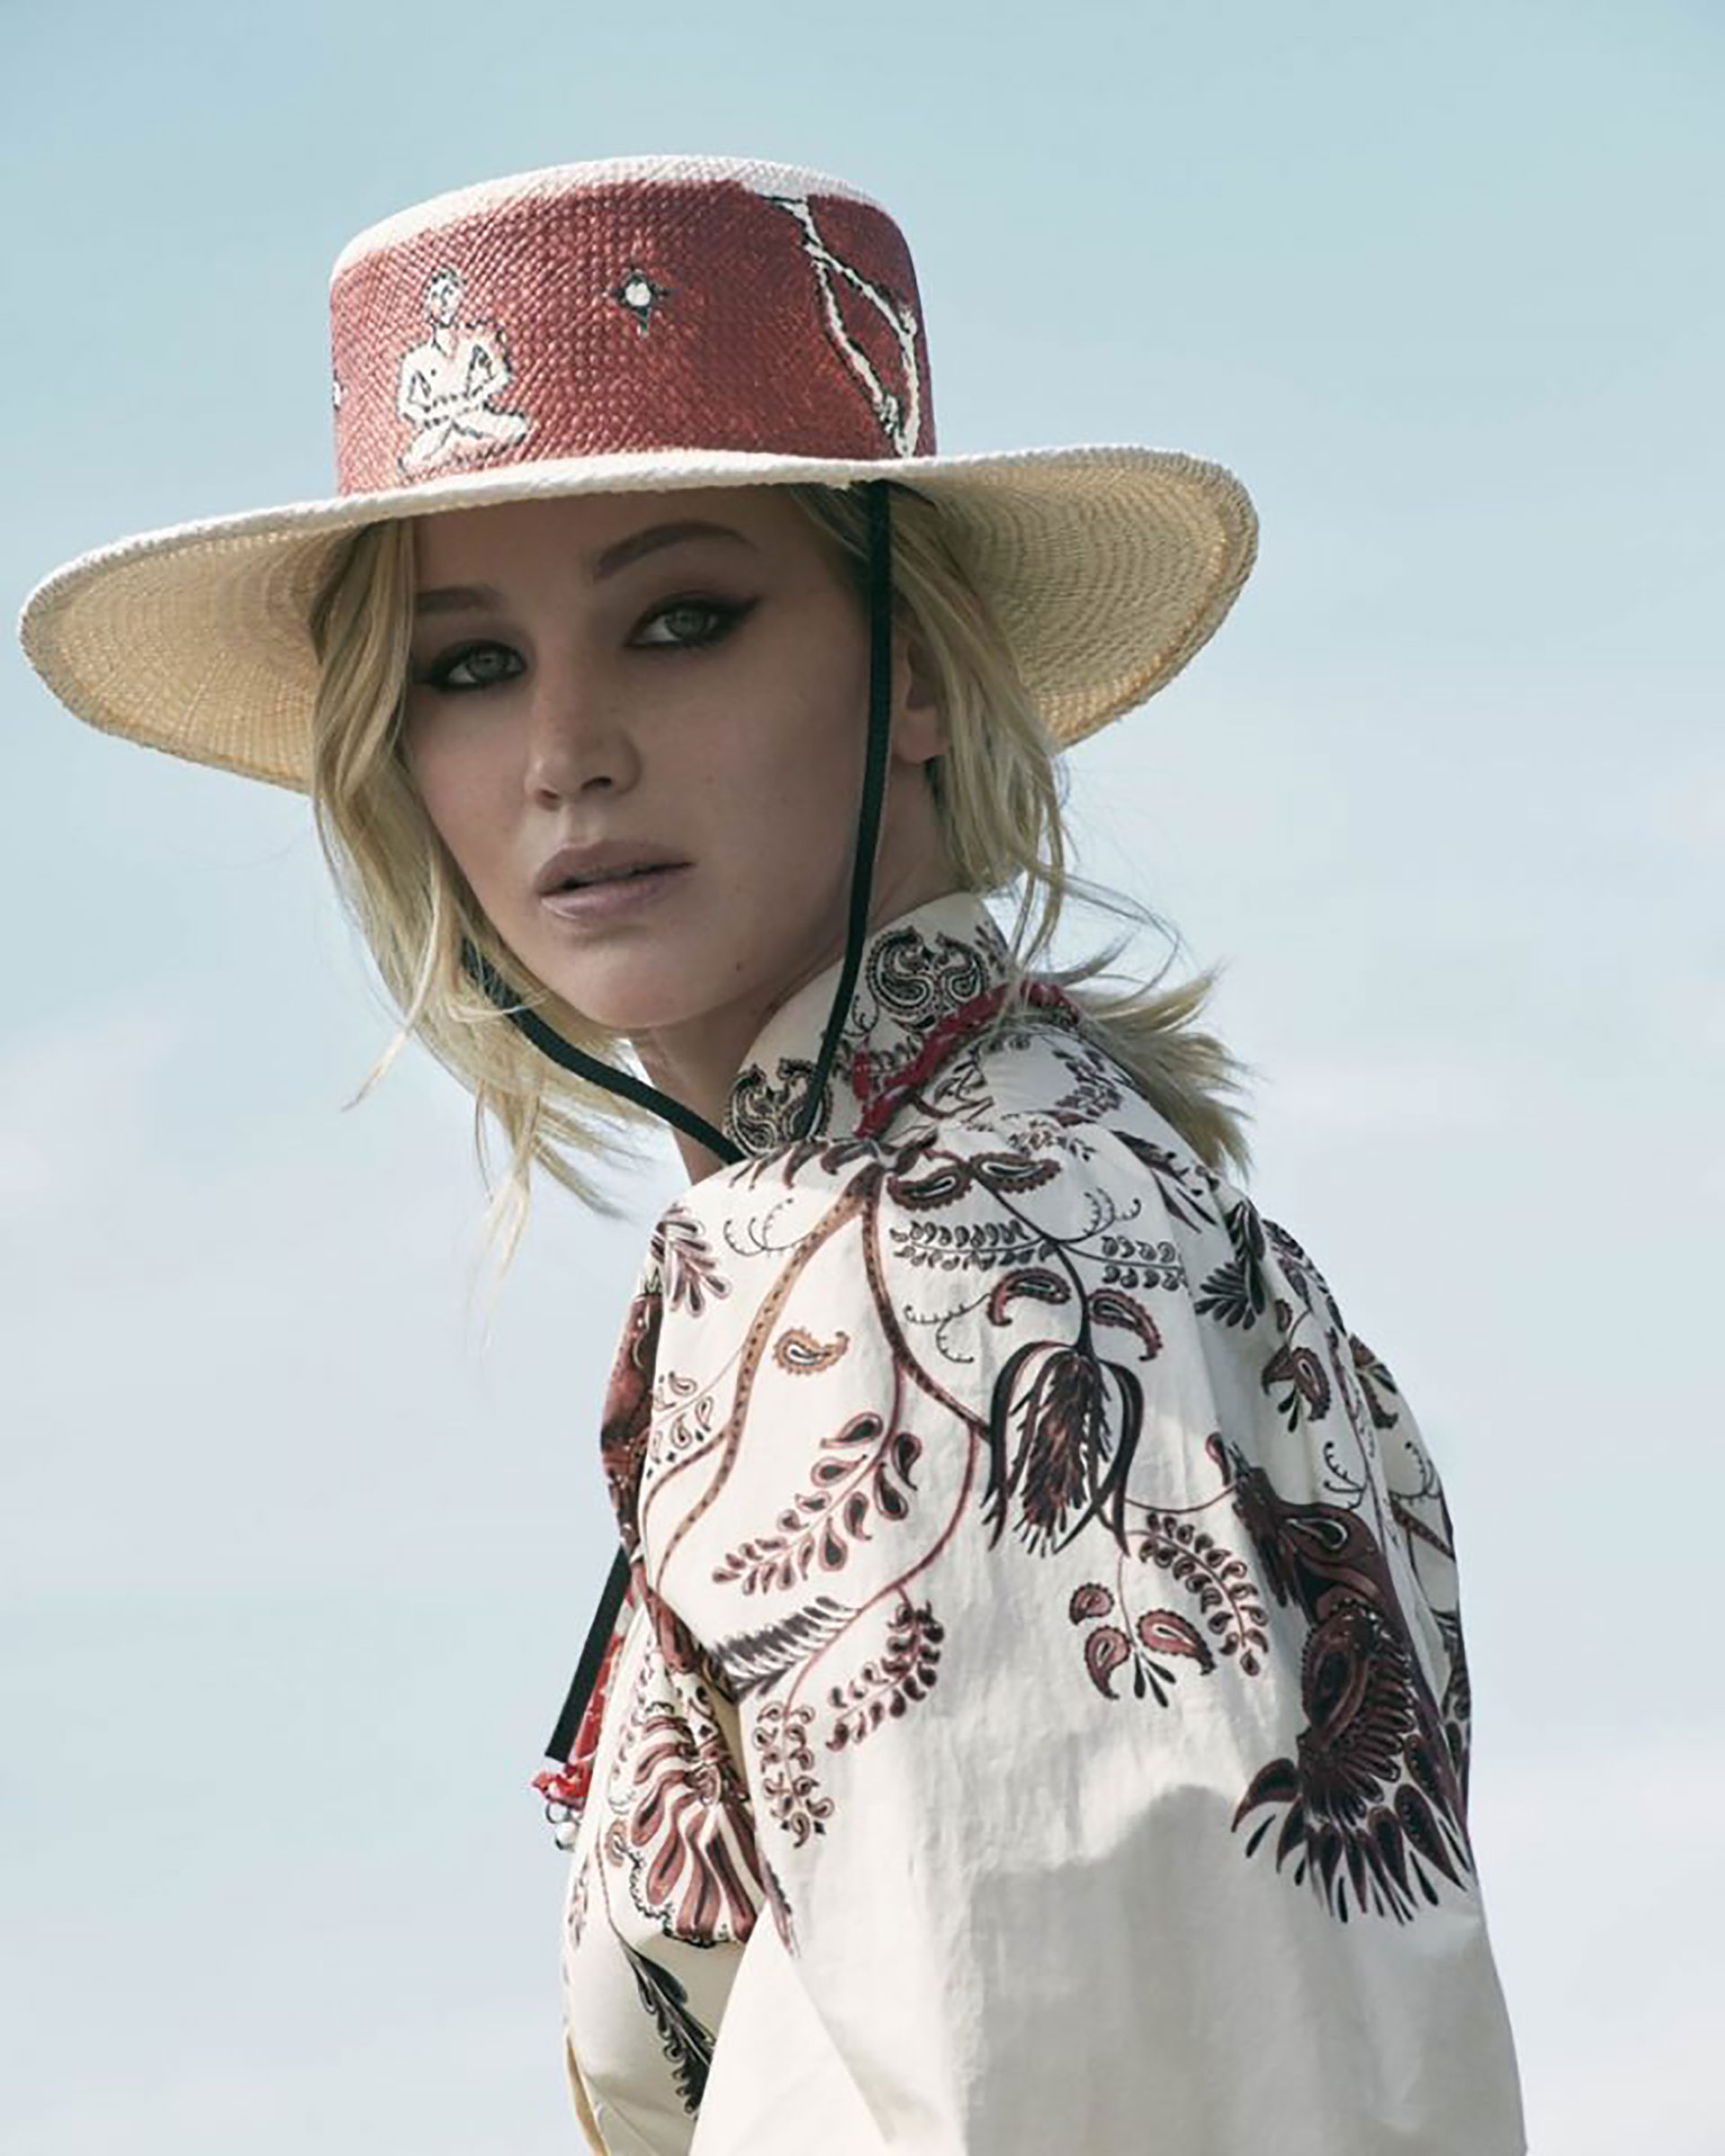 Jennifer Lawrence elegida desde 2012 por la firma Dior como musa de la maison